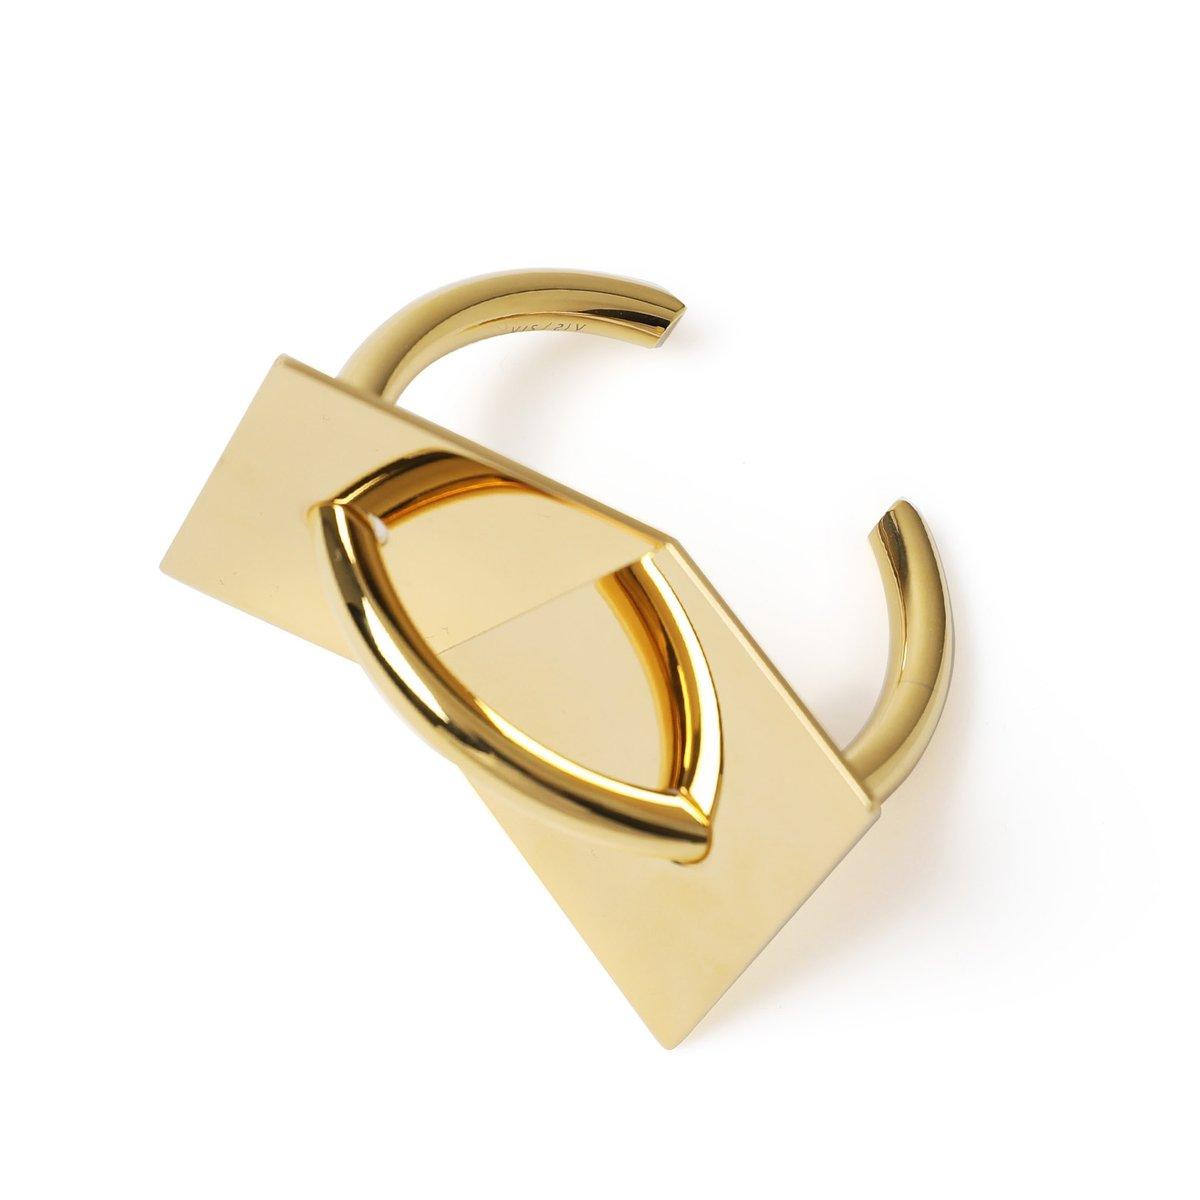 Image of Bracelet - TRAVERSAL